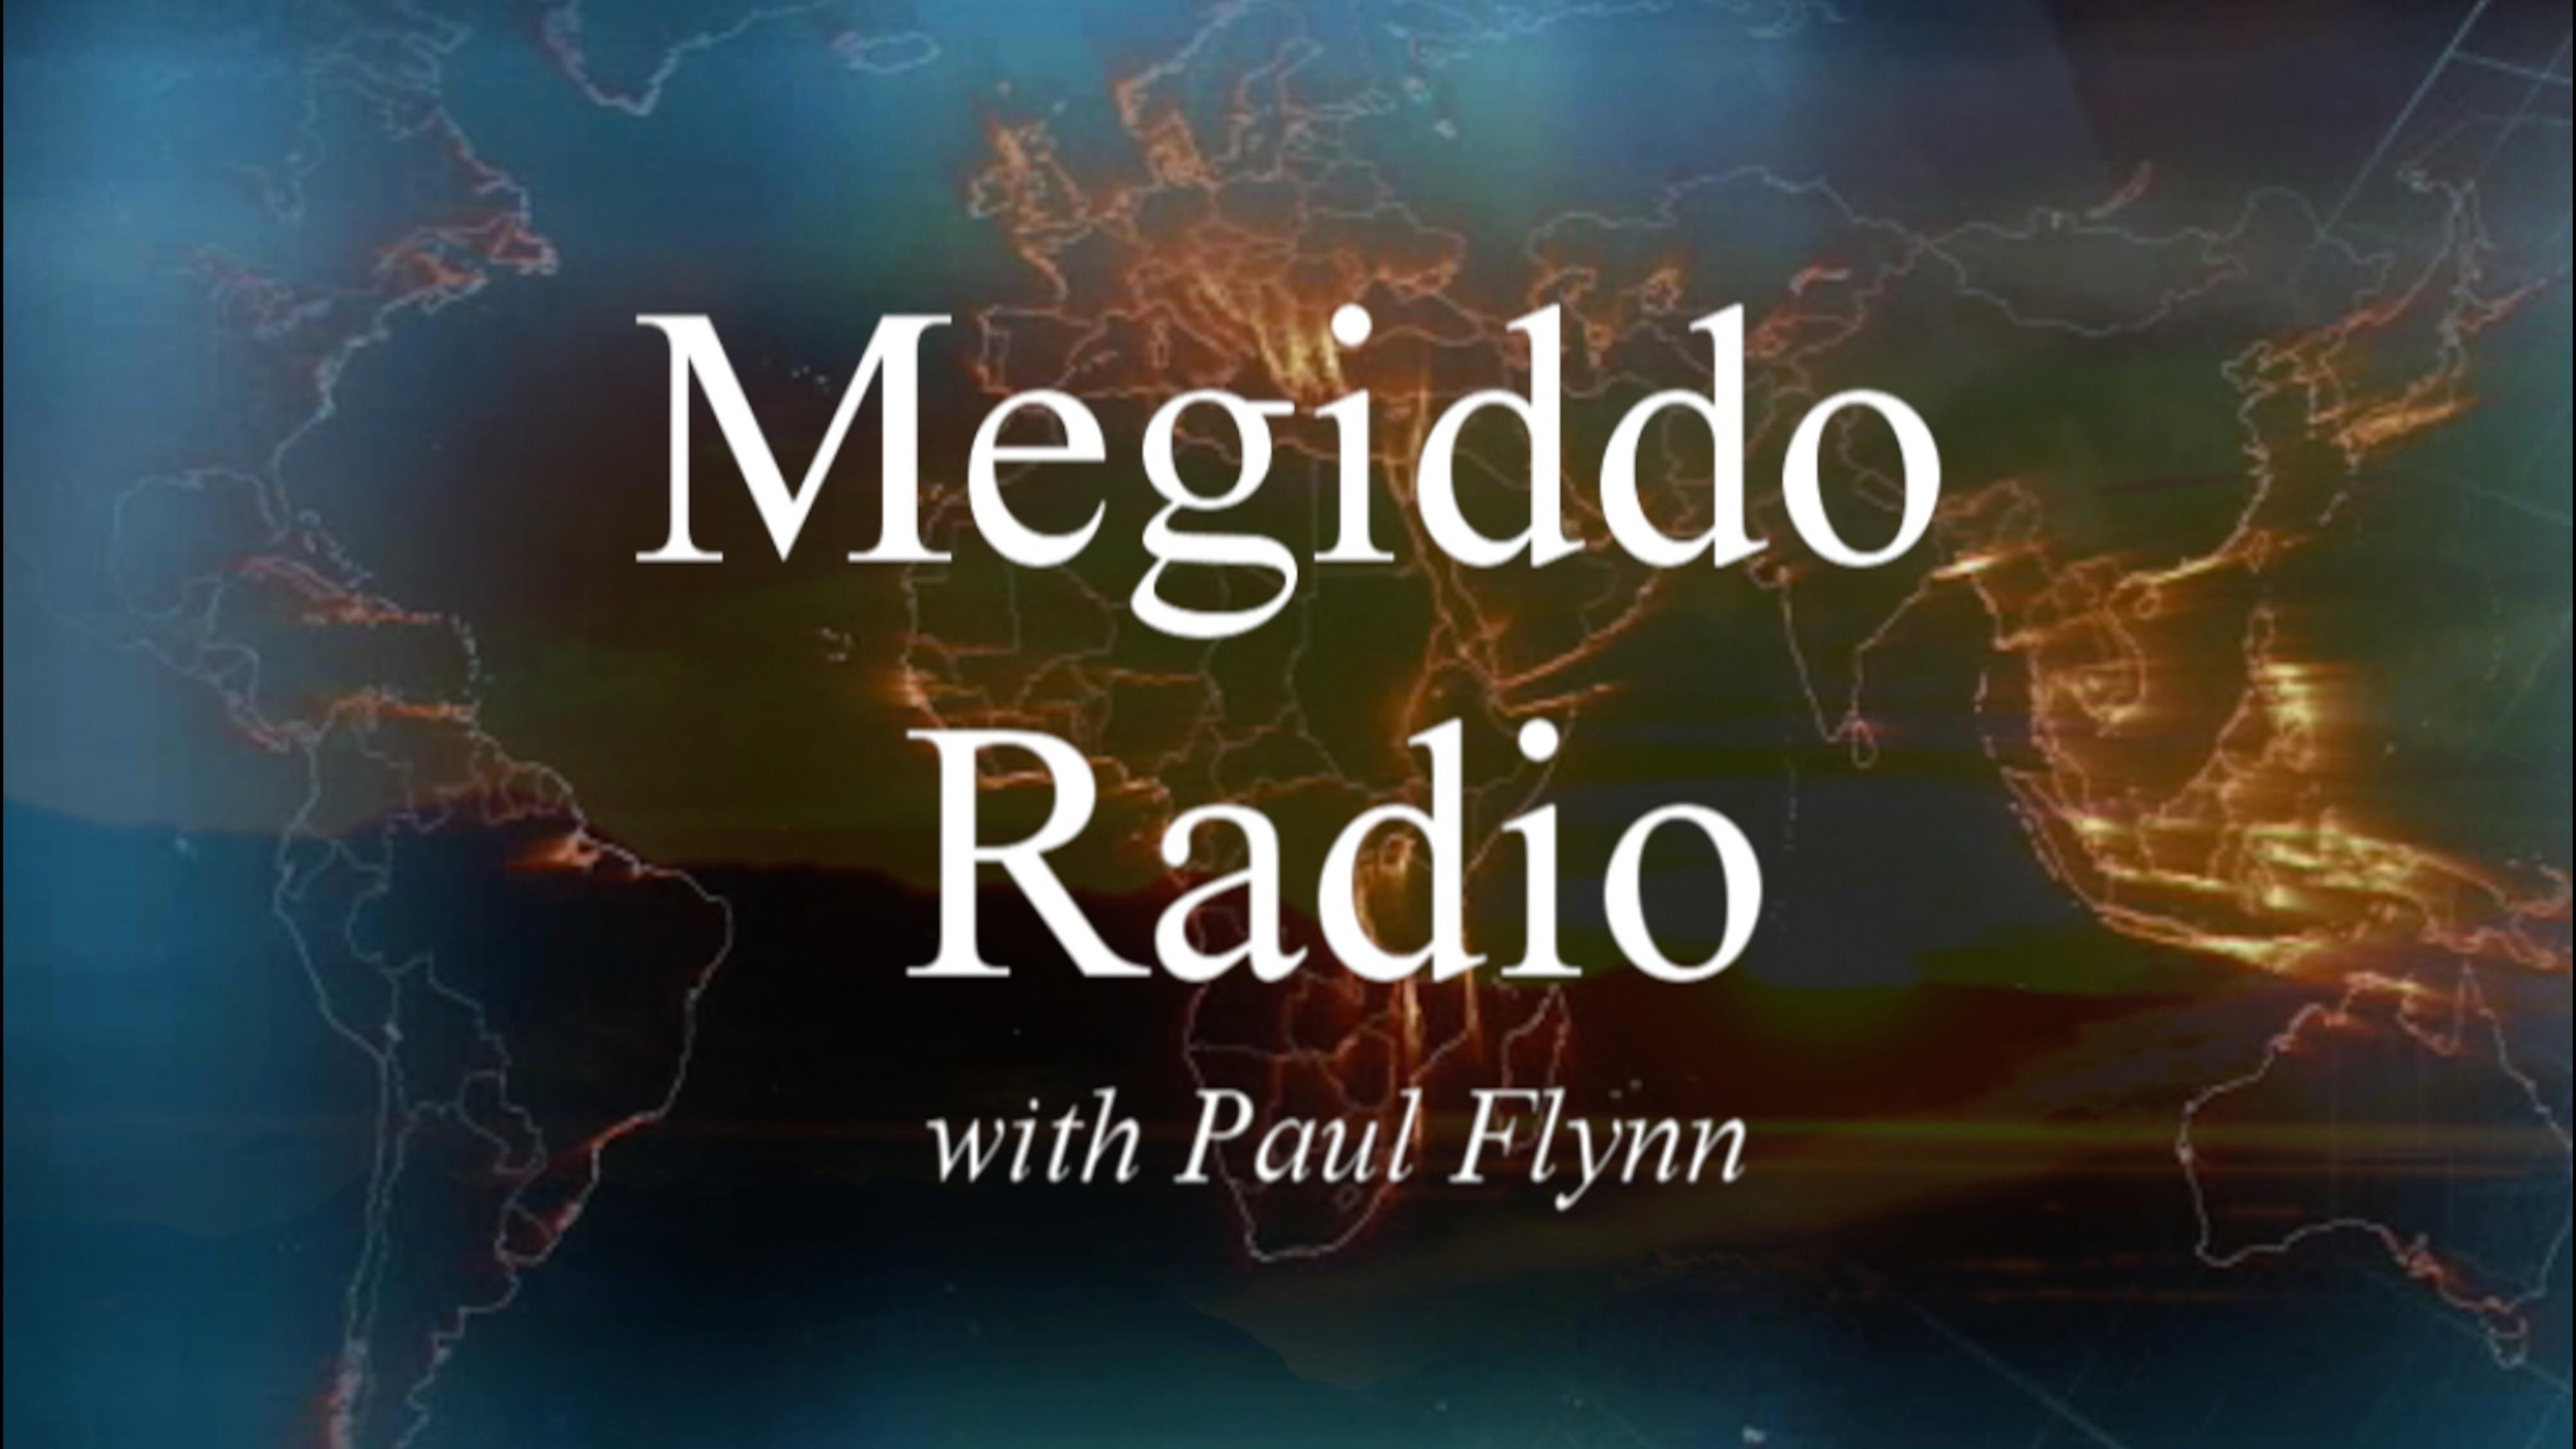 Megiddo Radio